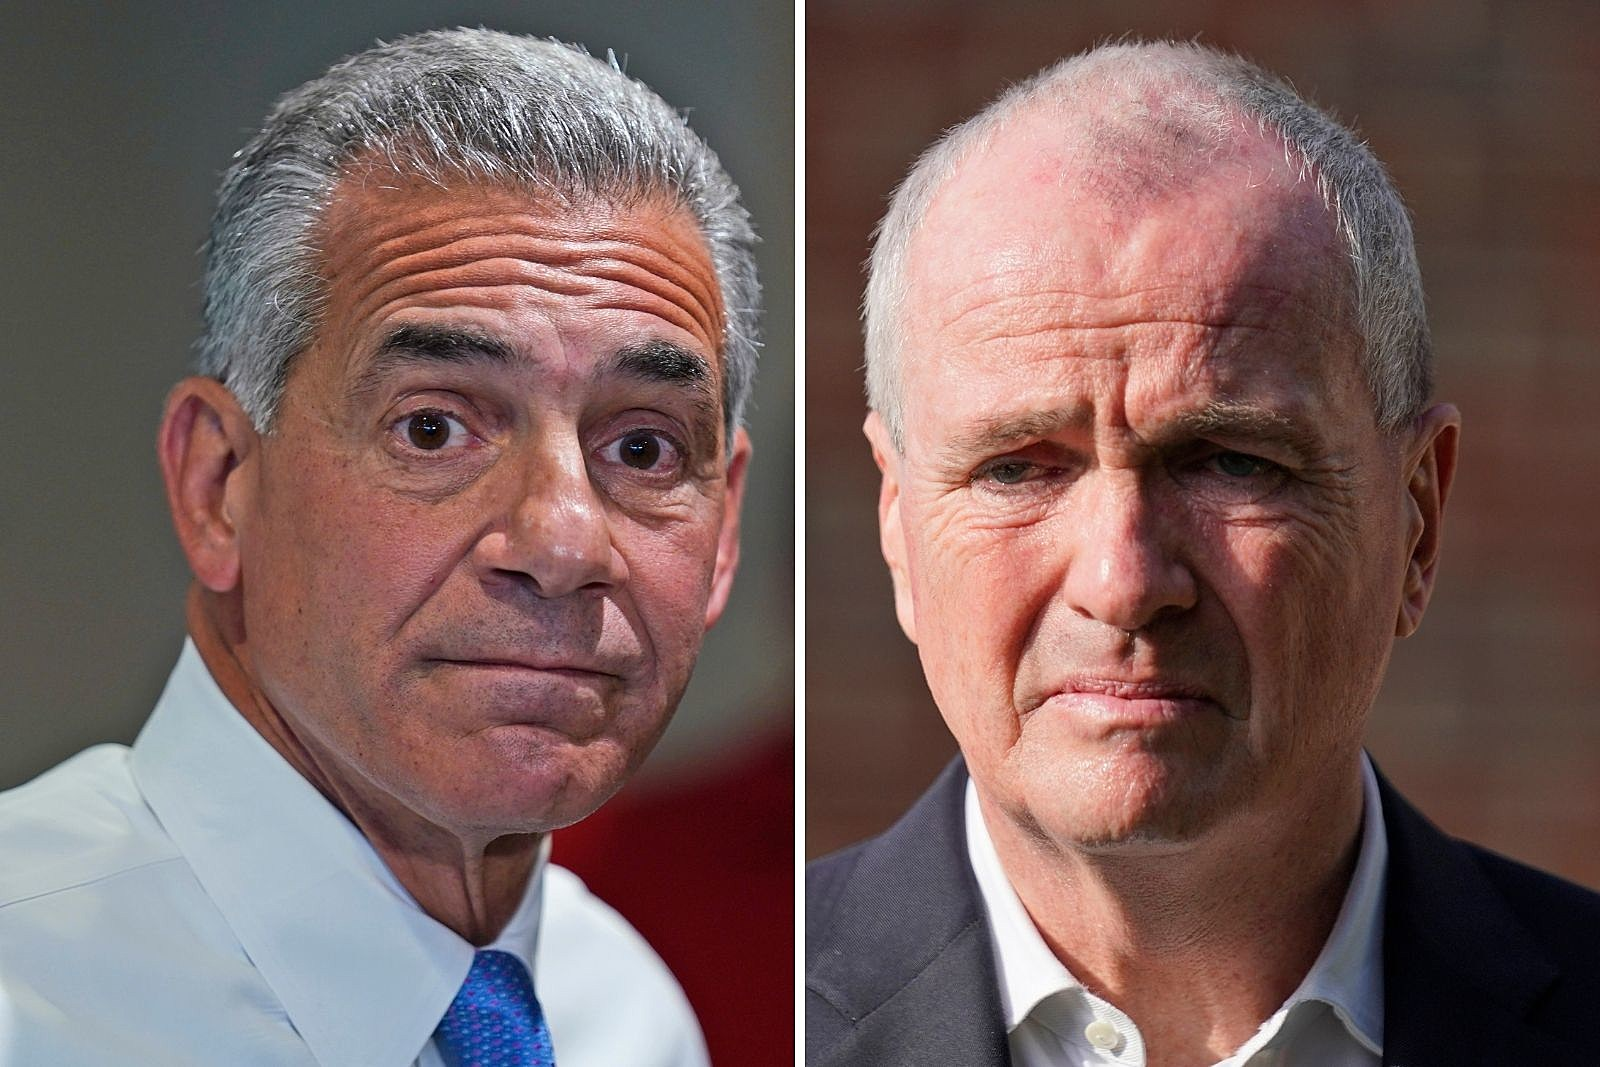 Watch Ciattarelli and Murphy debate tonight: NJ's next governor